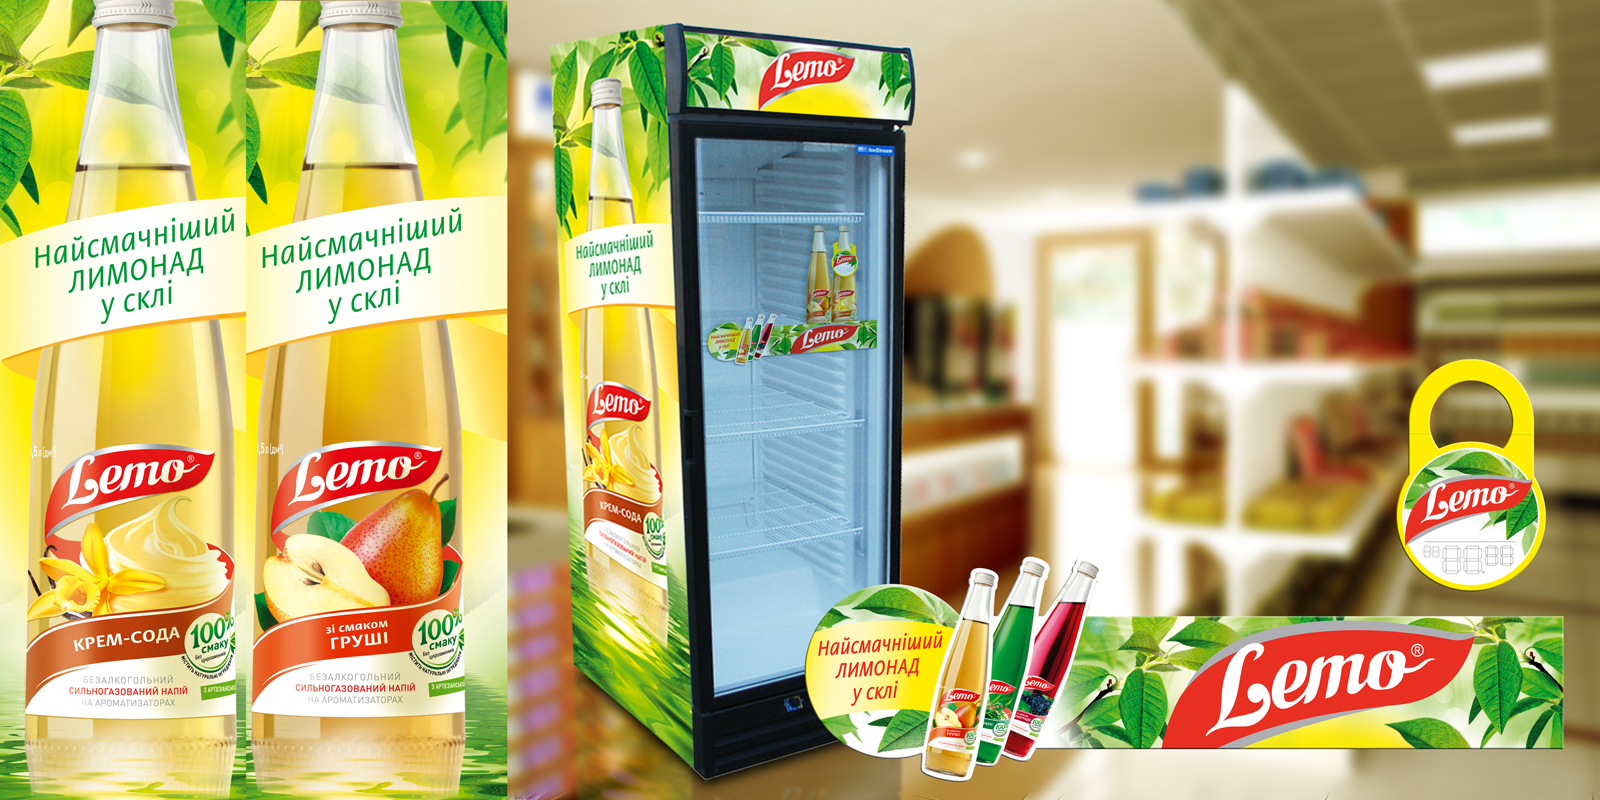 TM Lemo;;;;;;Разработка шаблона брендирования холодильника;;;;;;<span>Клиент:</span> TM Lemo;;;;;;;;;;;;Разработка шаблона брендирования холодильника;;;;;;4